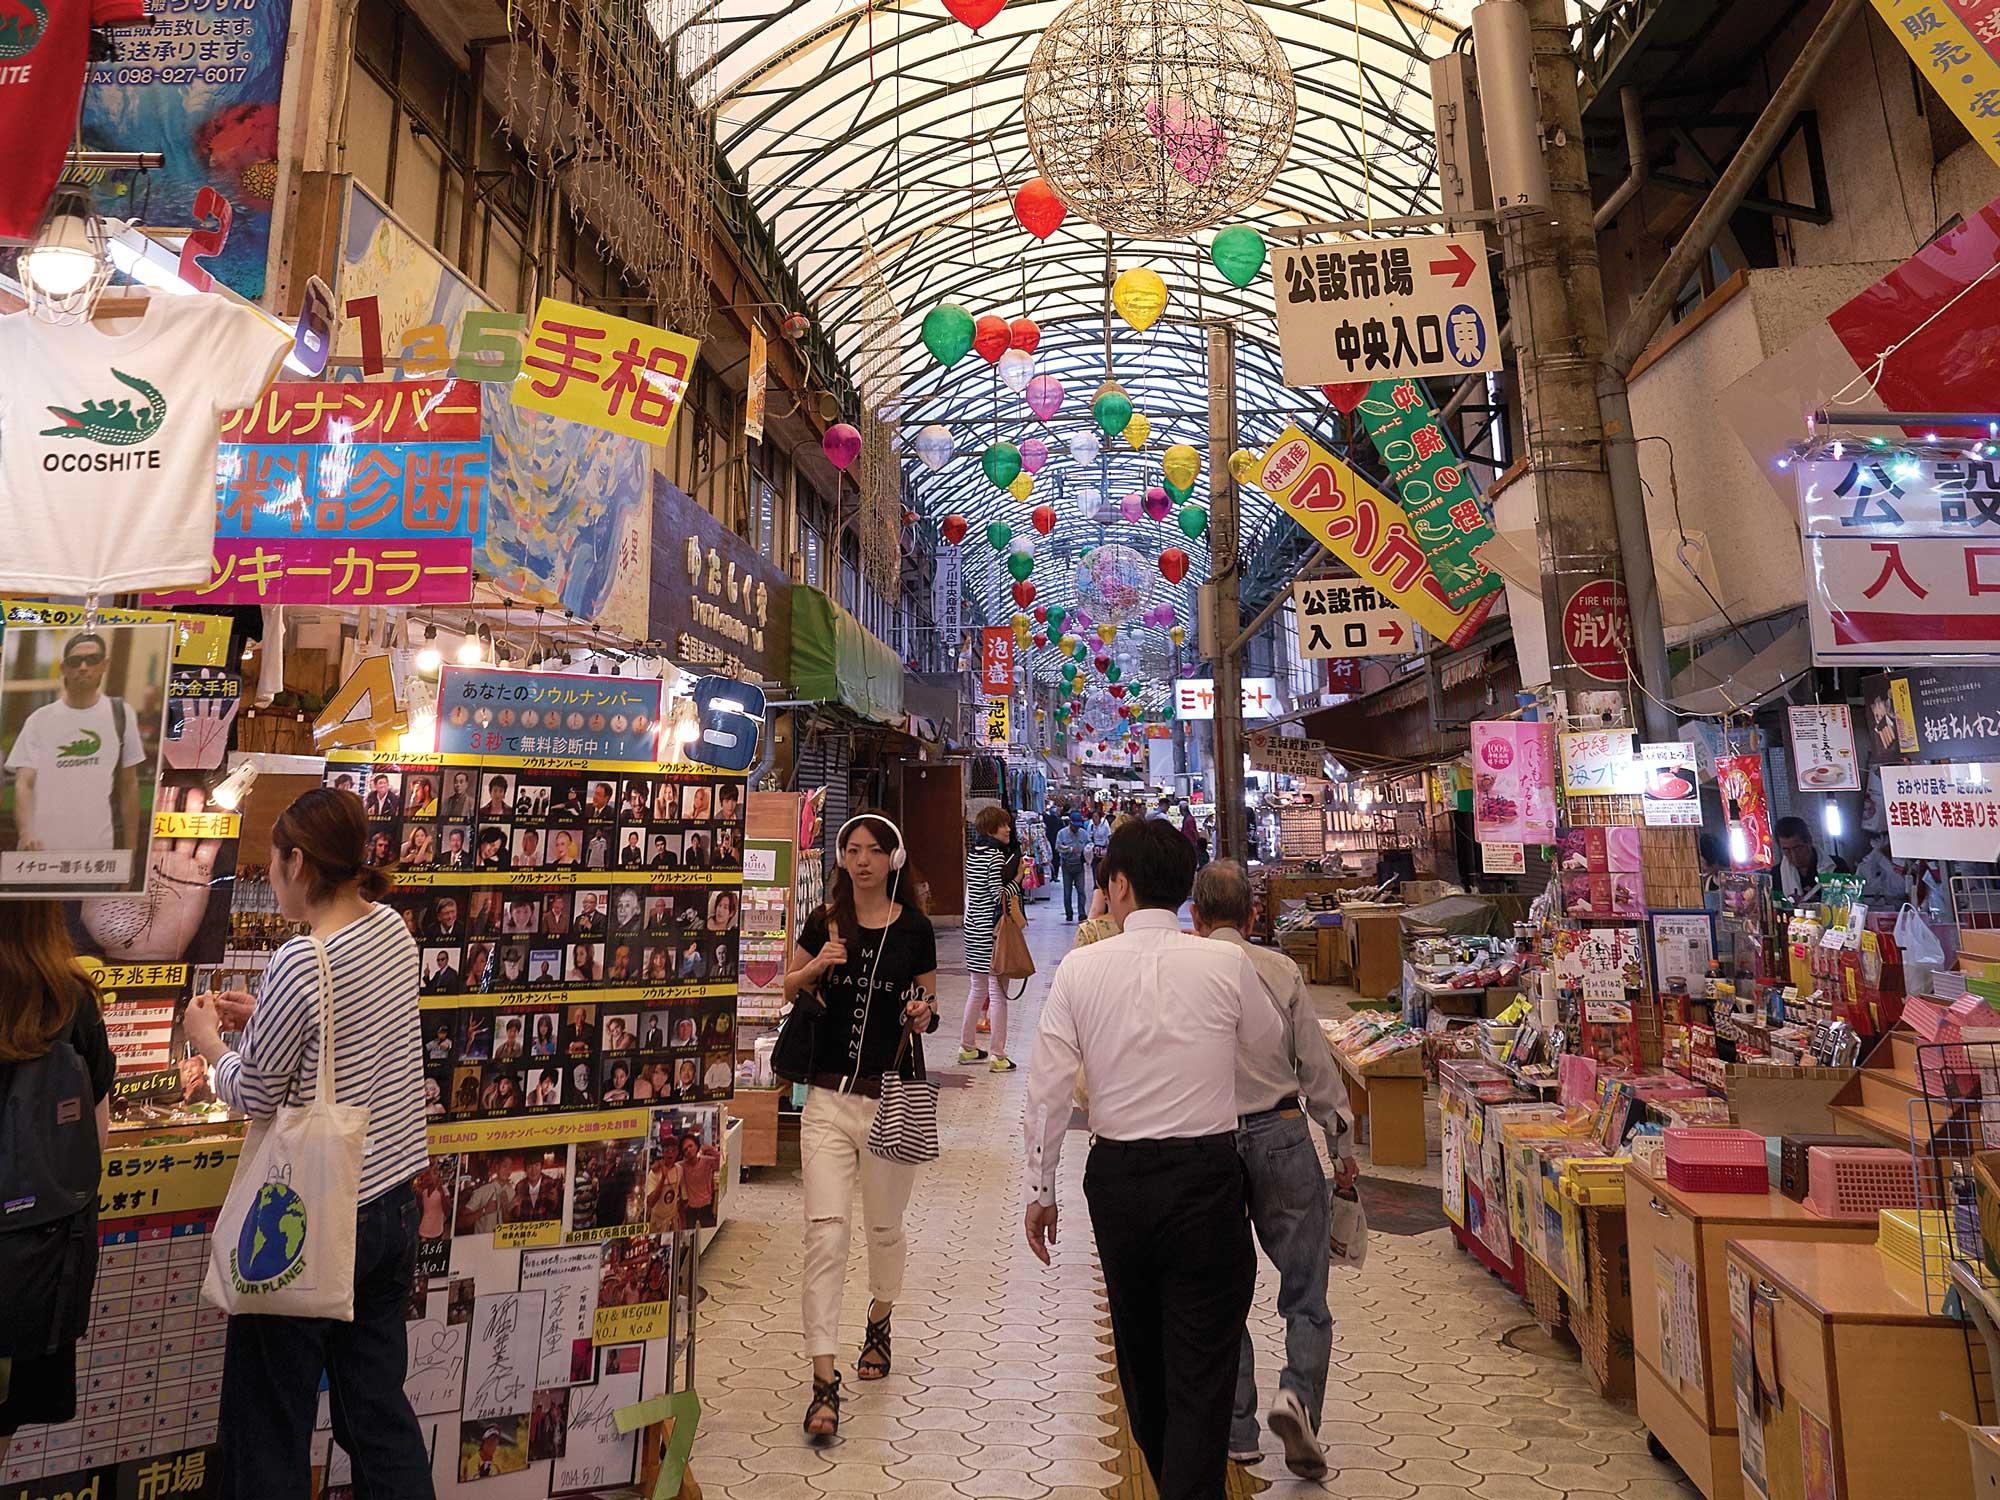 Makishi Public Market; Naha, Okinawa, Japan